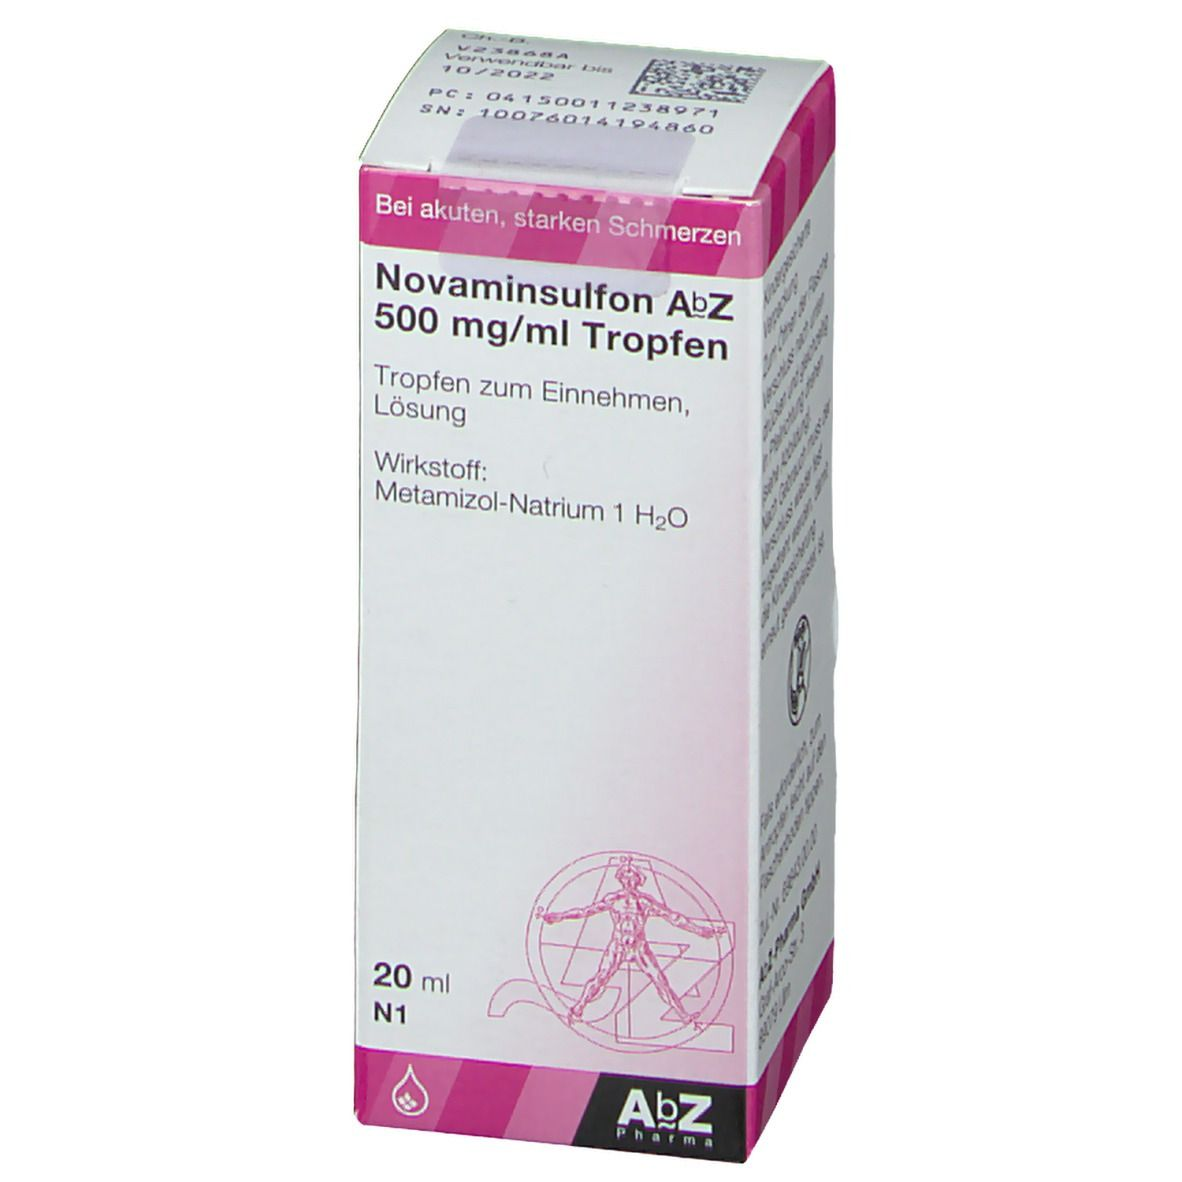 NOVAMINSULFON AbZ 500 mg/ml Tropfen